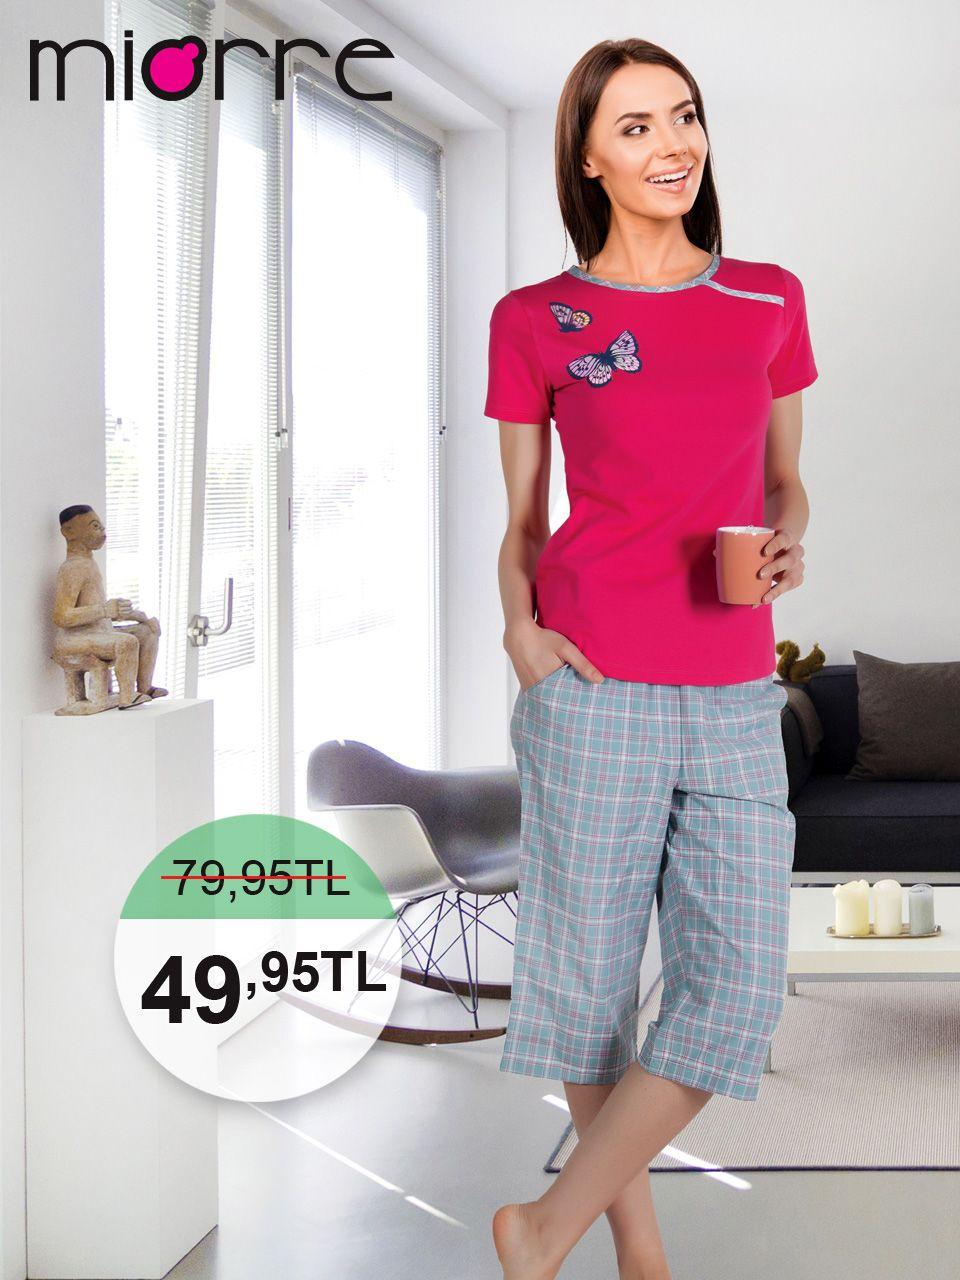 Miorre Bayan Pijama Takimi Avrupa Networking Pijama Giyim